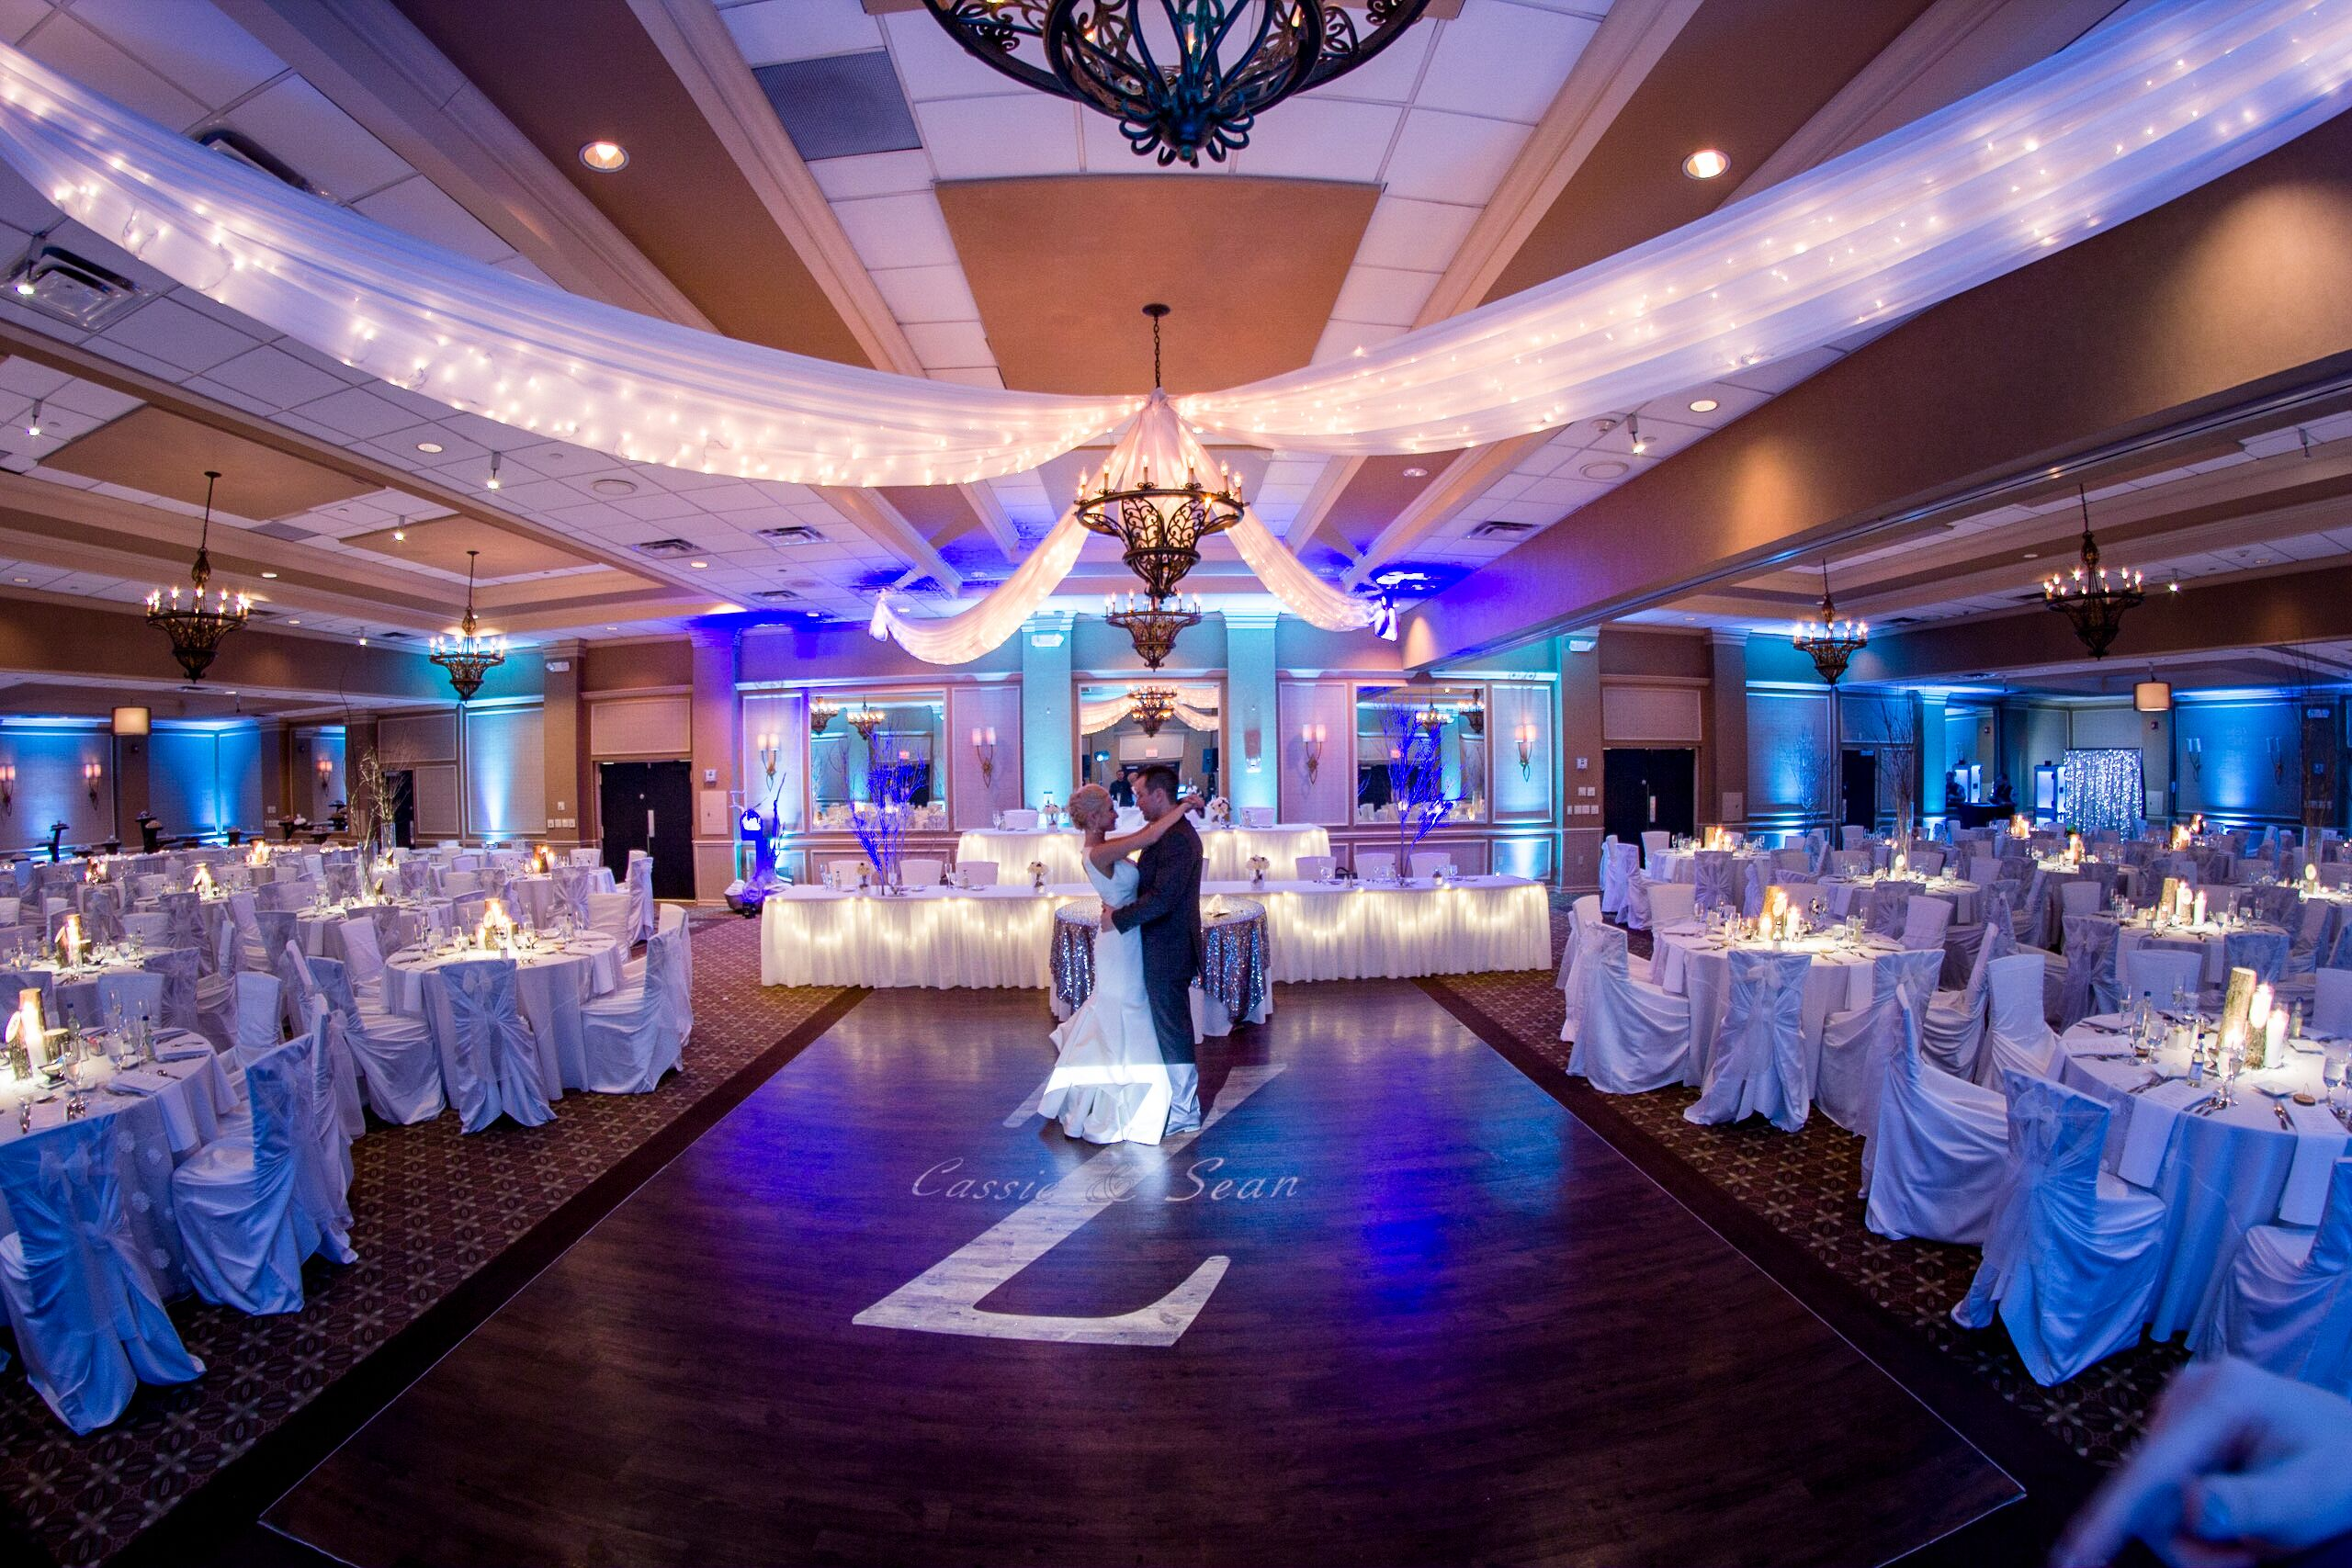 Doubletree Hotel Greentree Wedding: DoubleTree By Hilton Pittsburgh - Meadow Lands